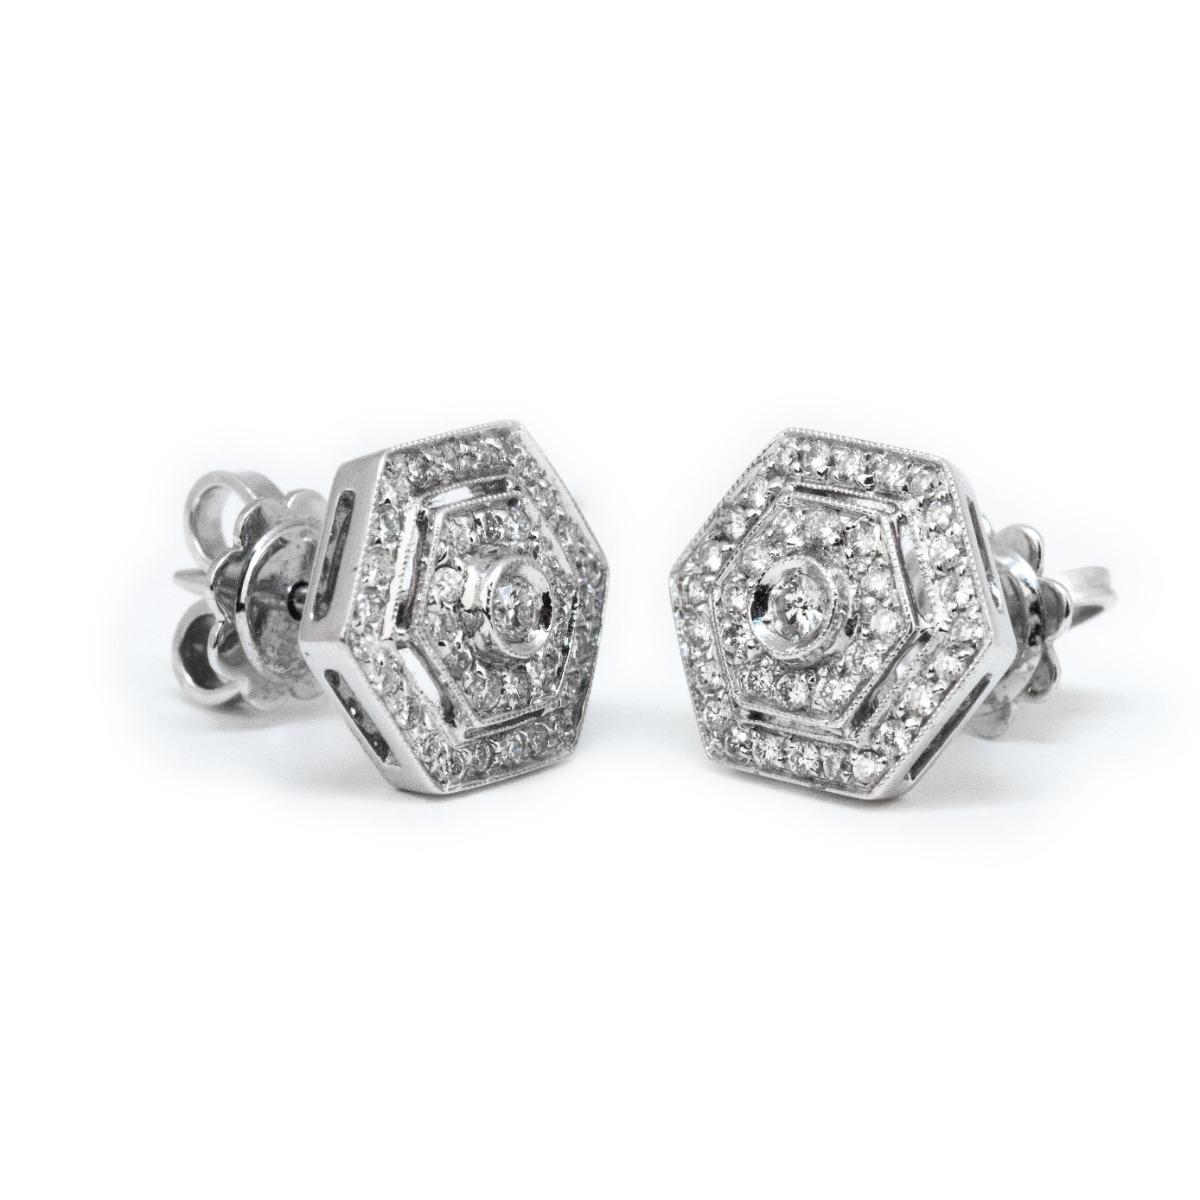 Hexagon-Shaped Diamond Earrings in White Gold